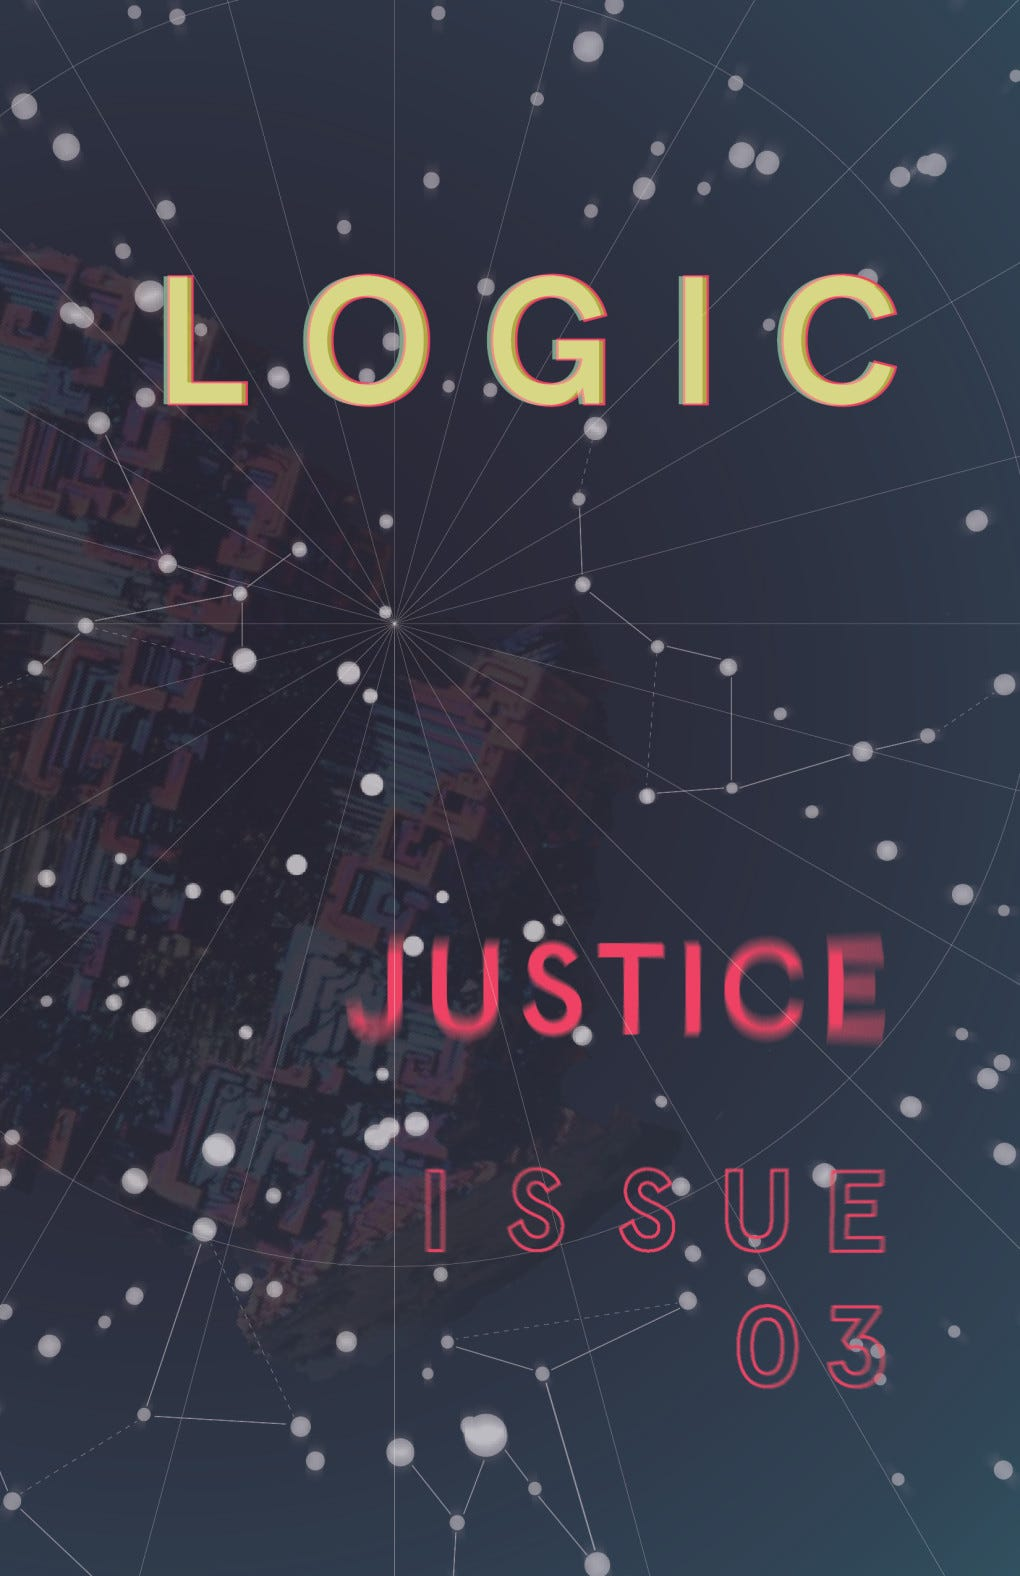 Justice: Issue 3 | Logic Magazine